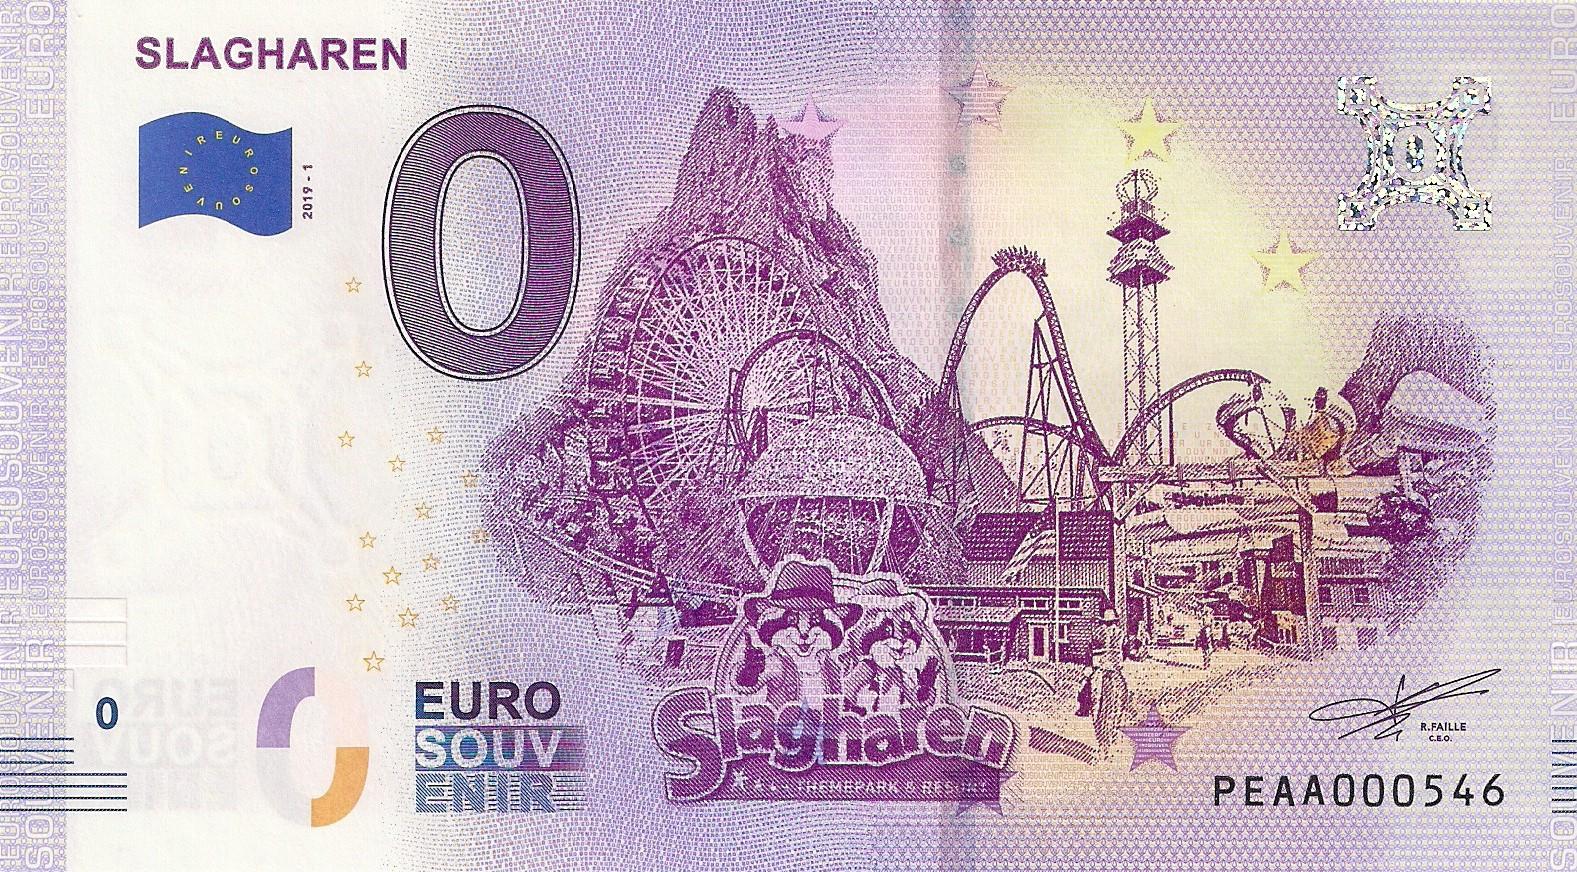 0-euro-slagharen-souvenir-note.jpg